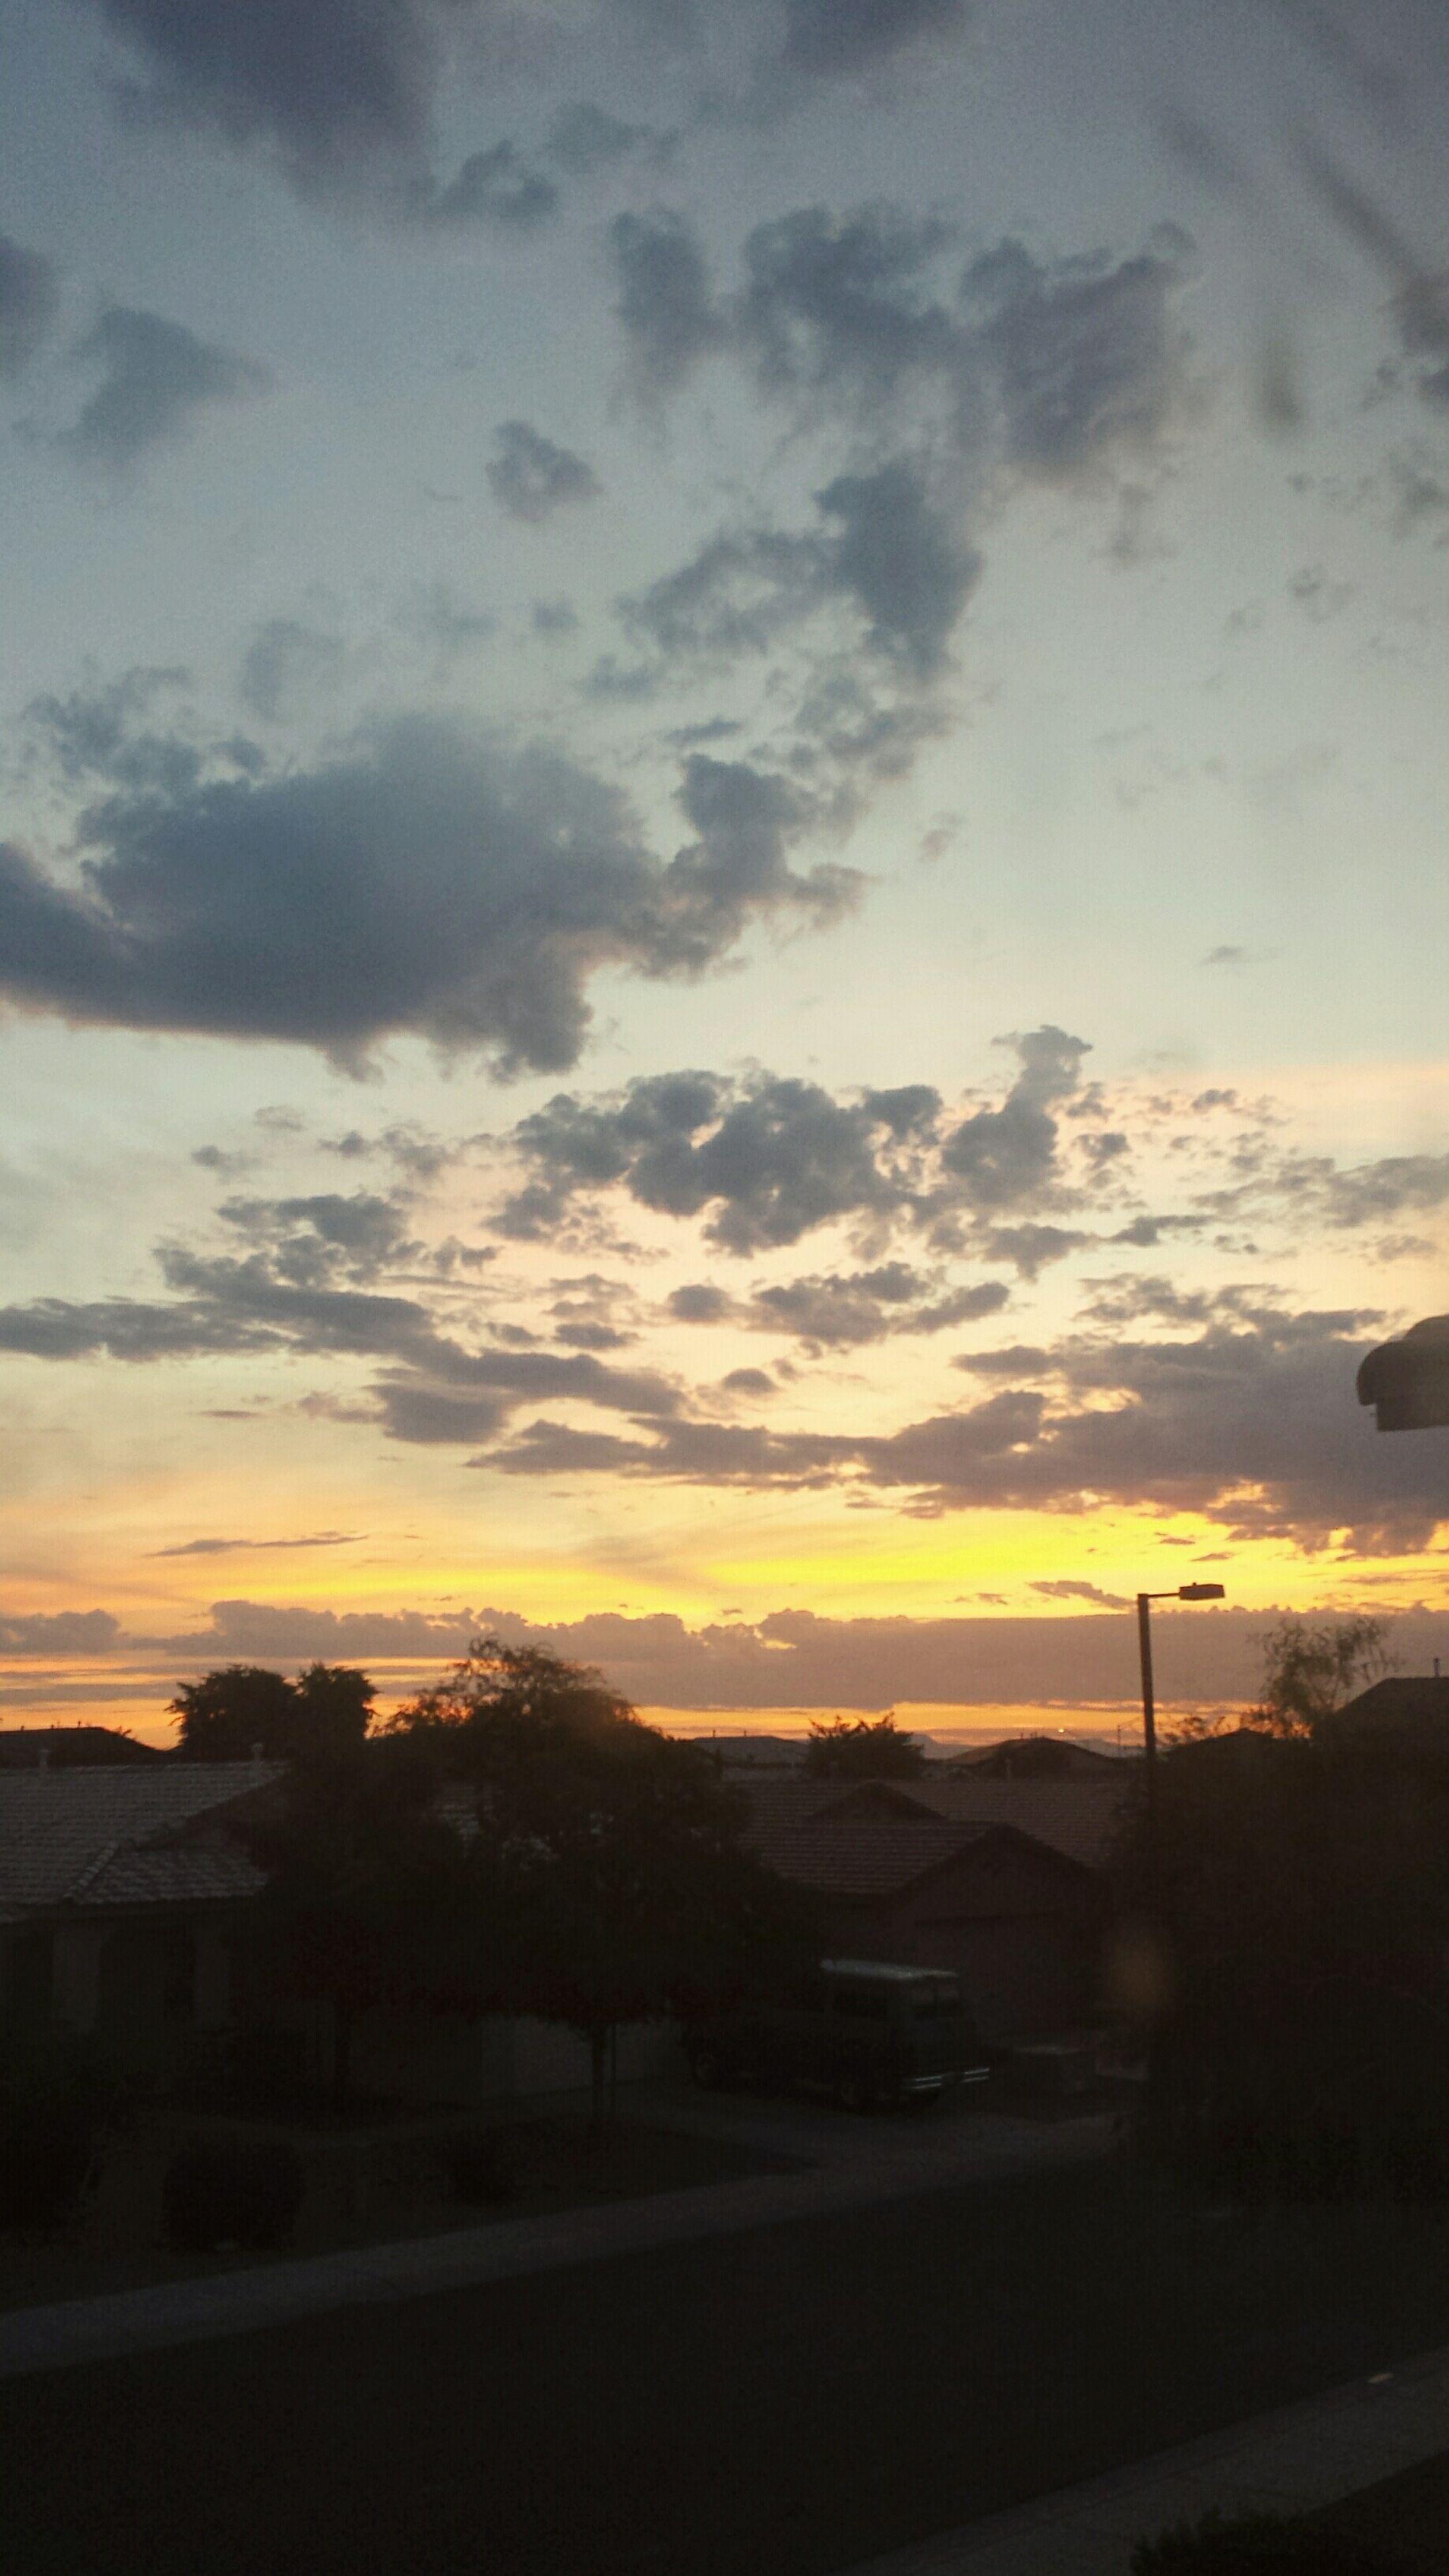 sunset, sky, cloud - sky, road, transportation, silhouette, landscape, scenics, orange color, beauty in nature, car, cloudy, nature, cloud, street, dramatic sky, tranquil scene, building exterior, built structure, mountain